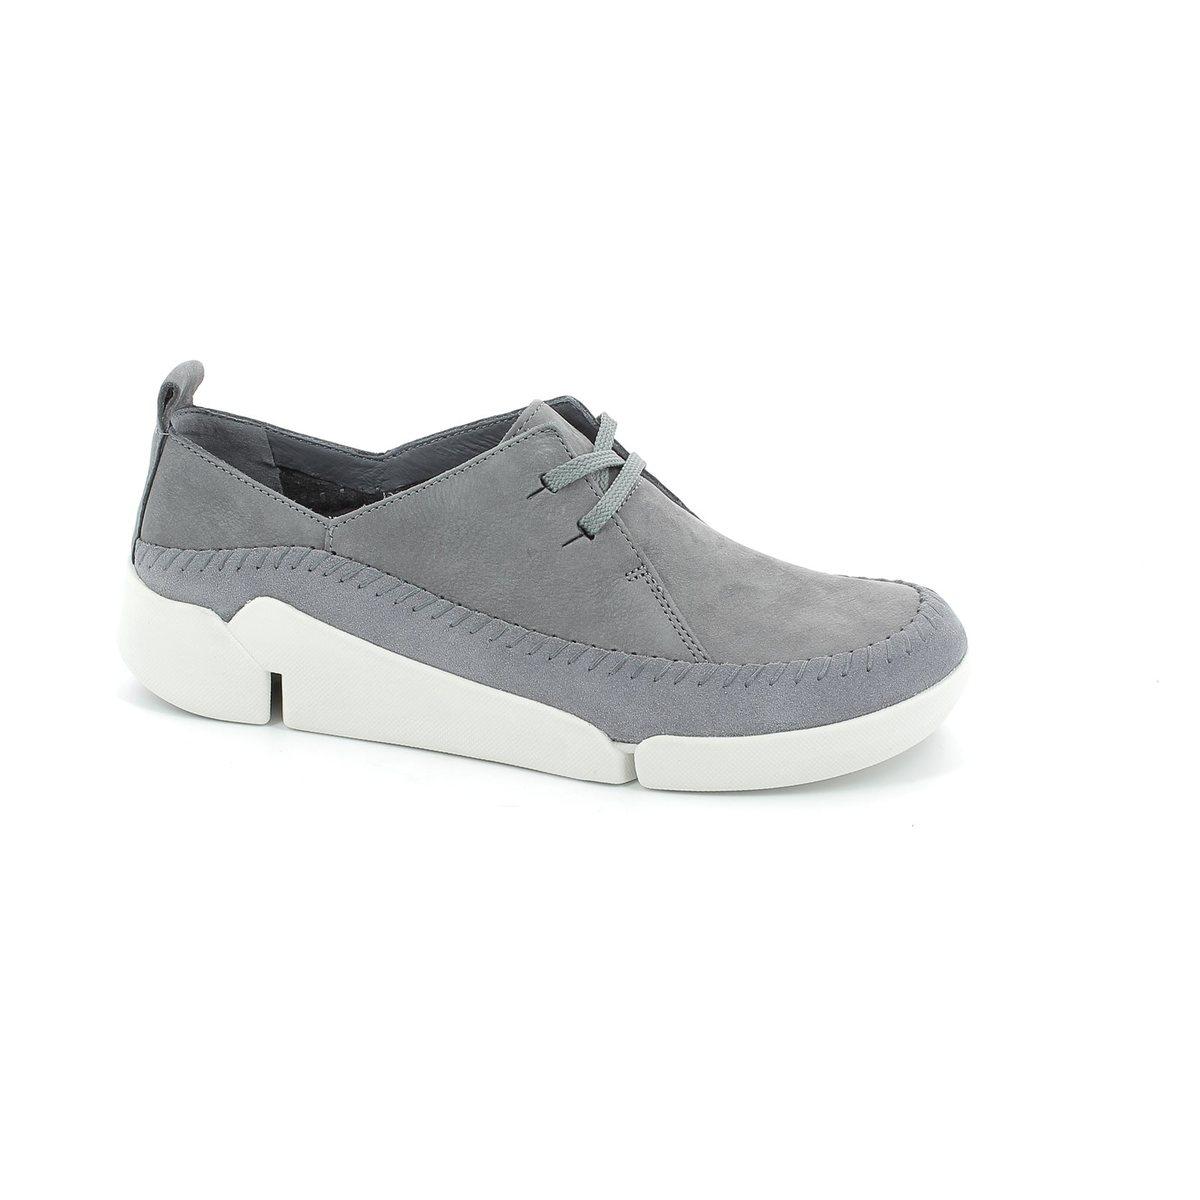 36ffd575f4e8 Clarks Lacing Shoes - Denim blue - 1564 04D TRI ANGEL